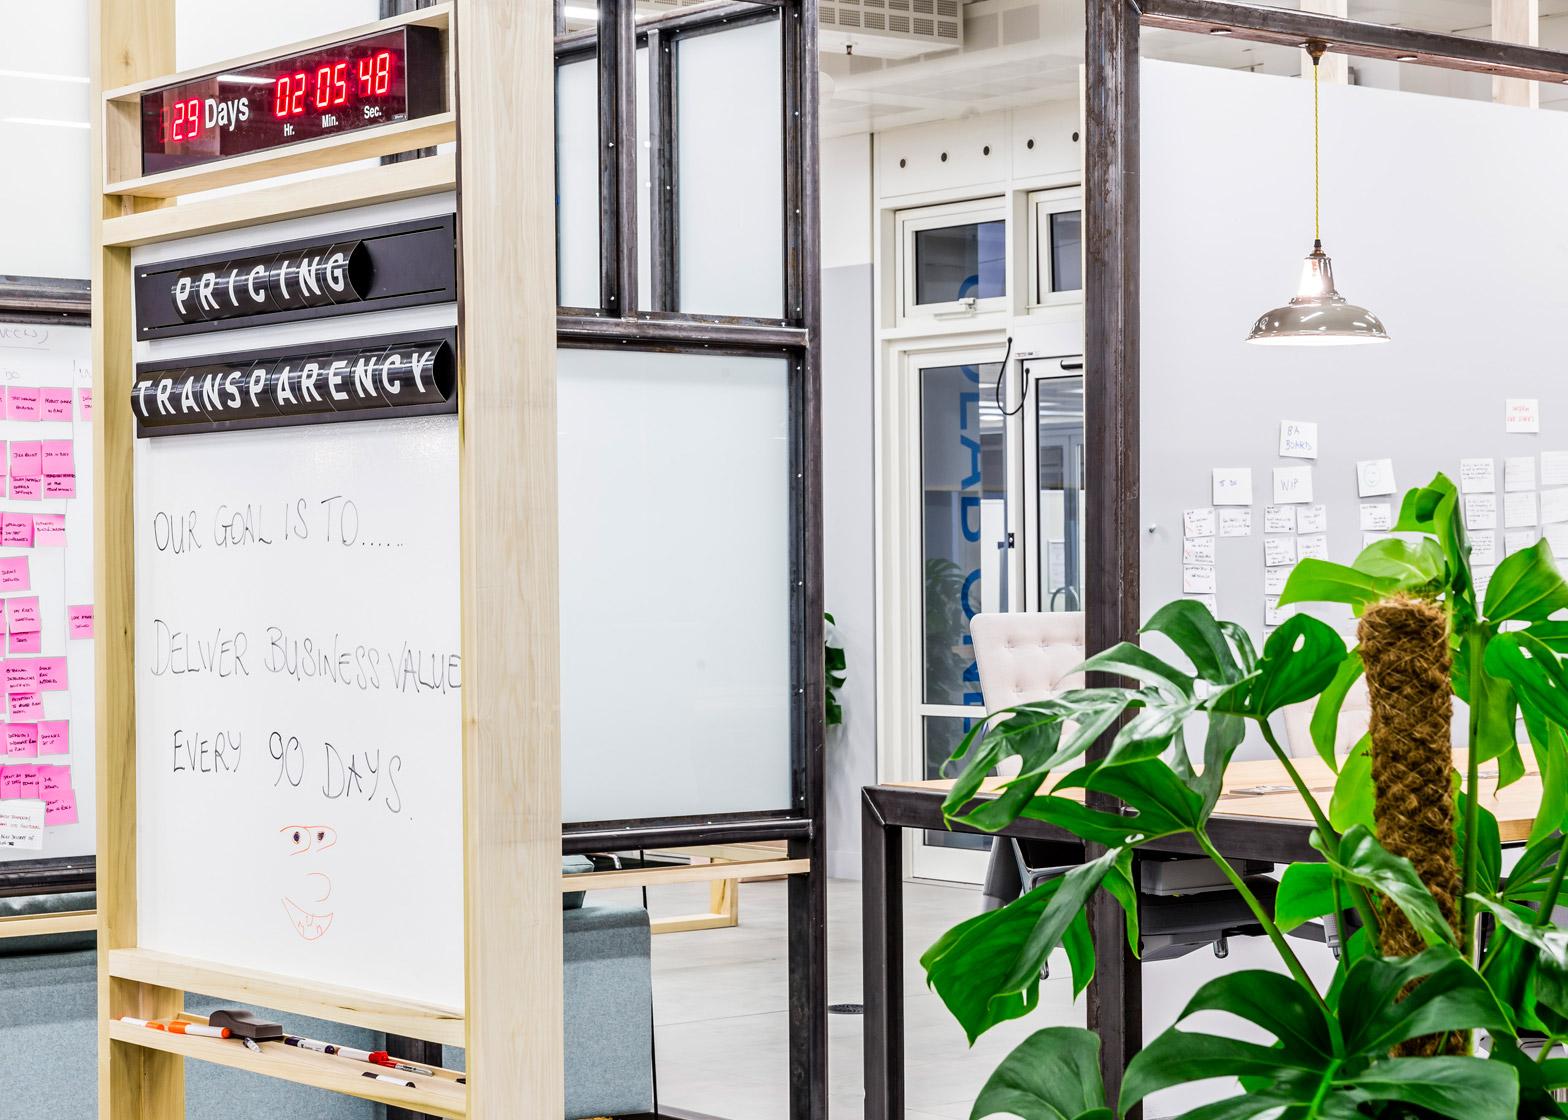 barclaycard-agile-workplace-APA-london-interior-design_dezeen_1568_7